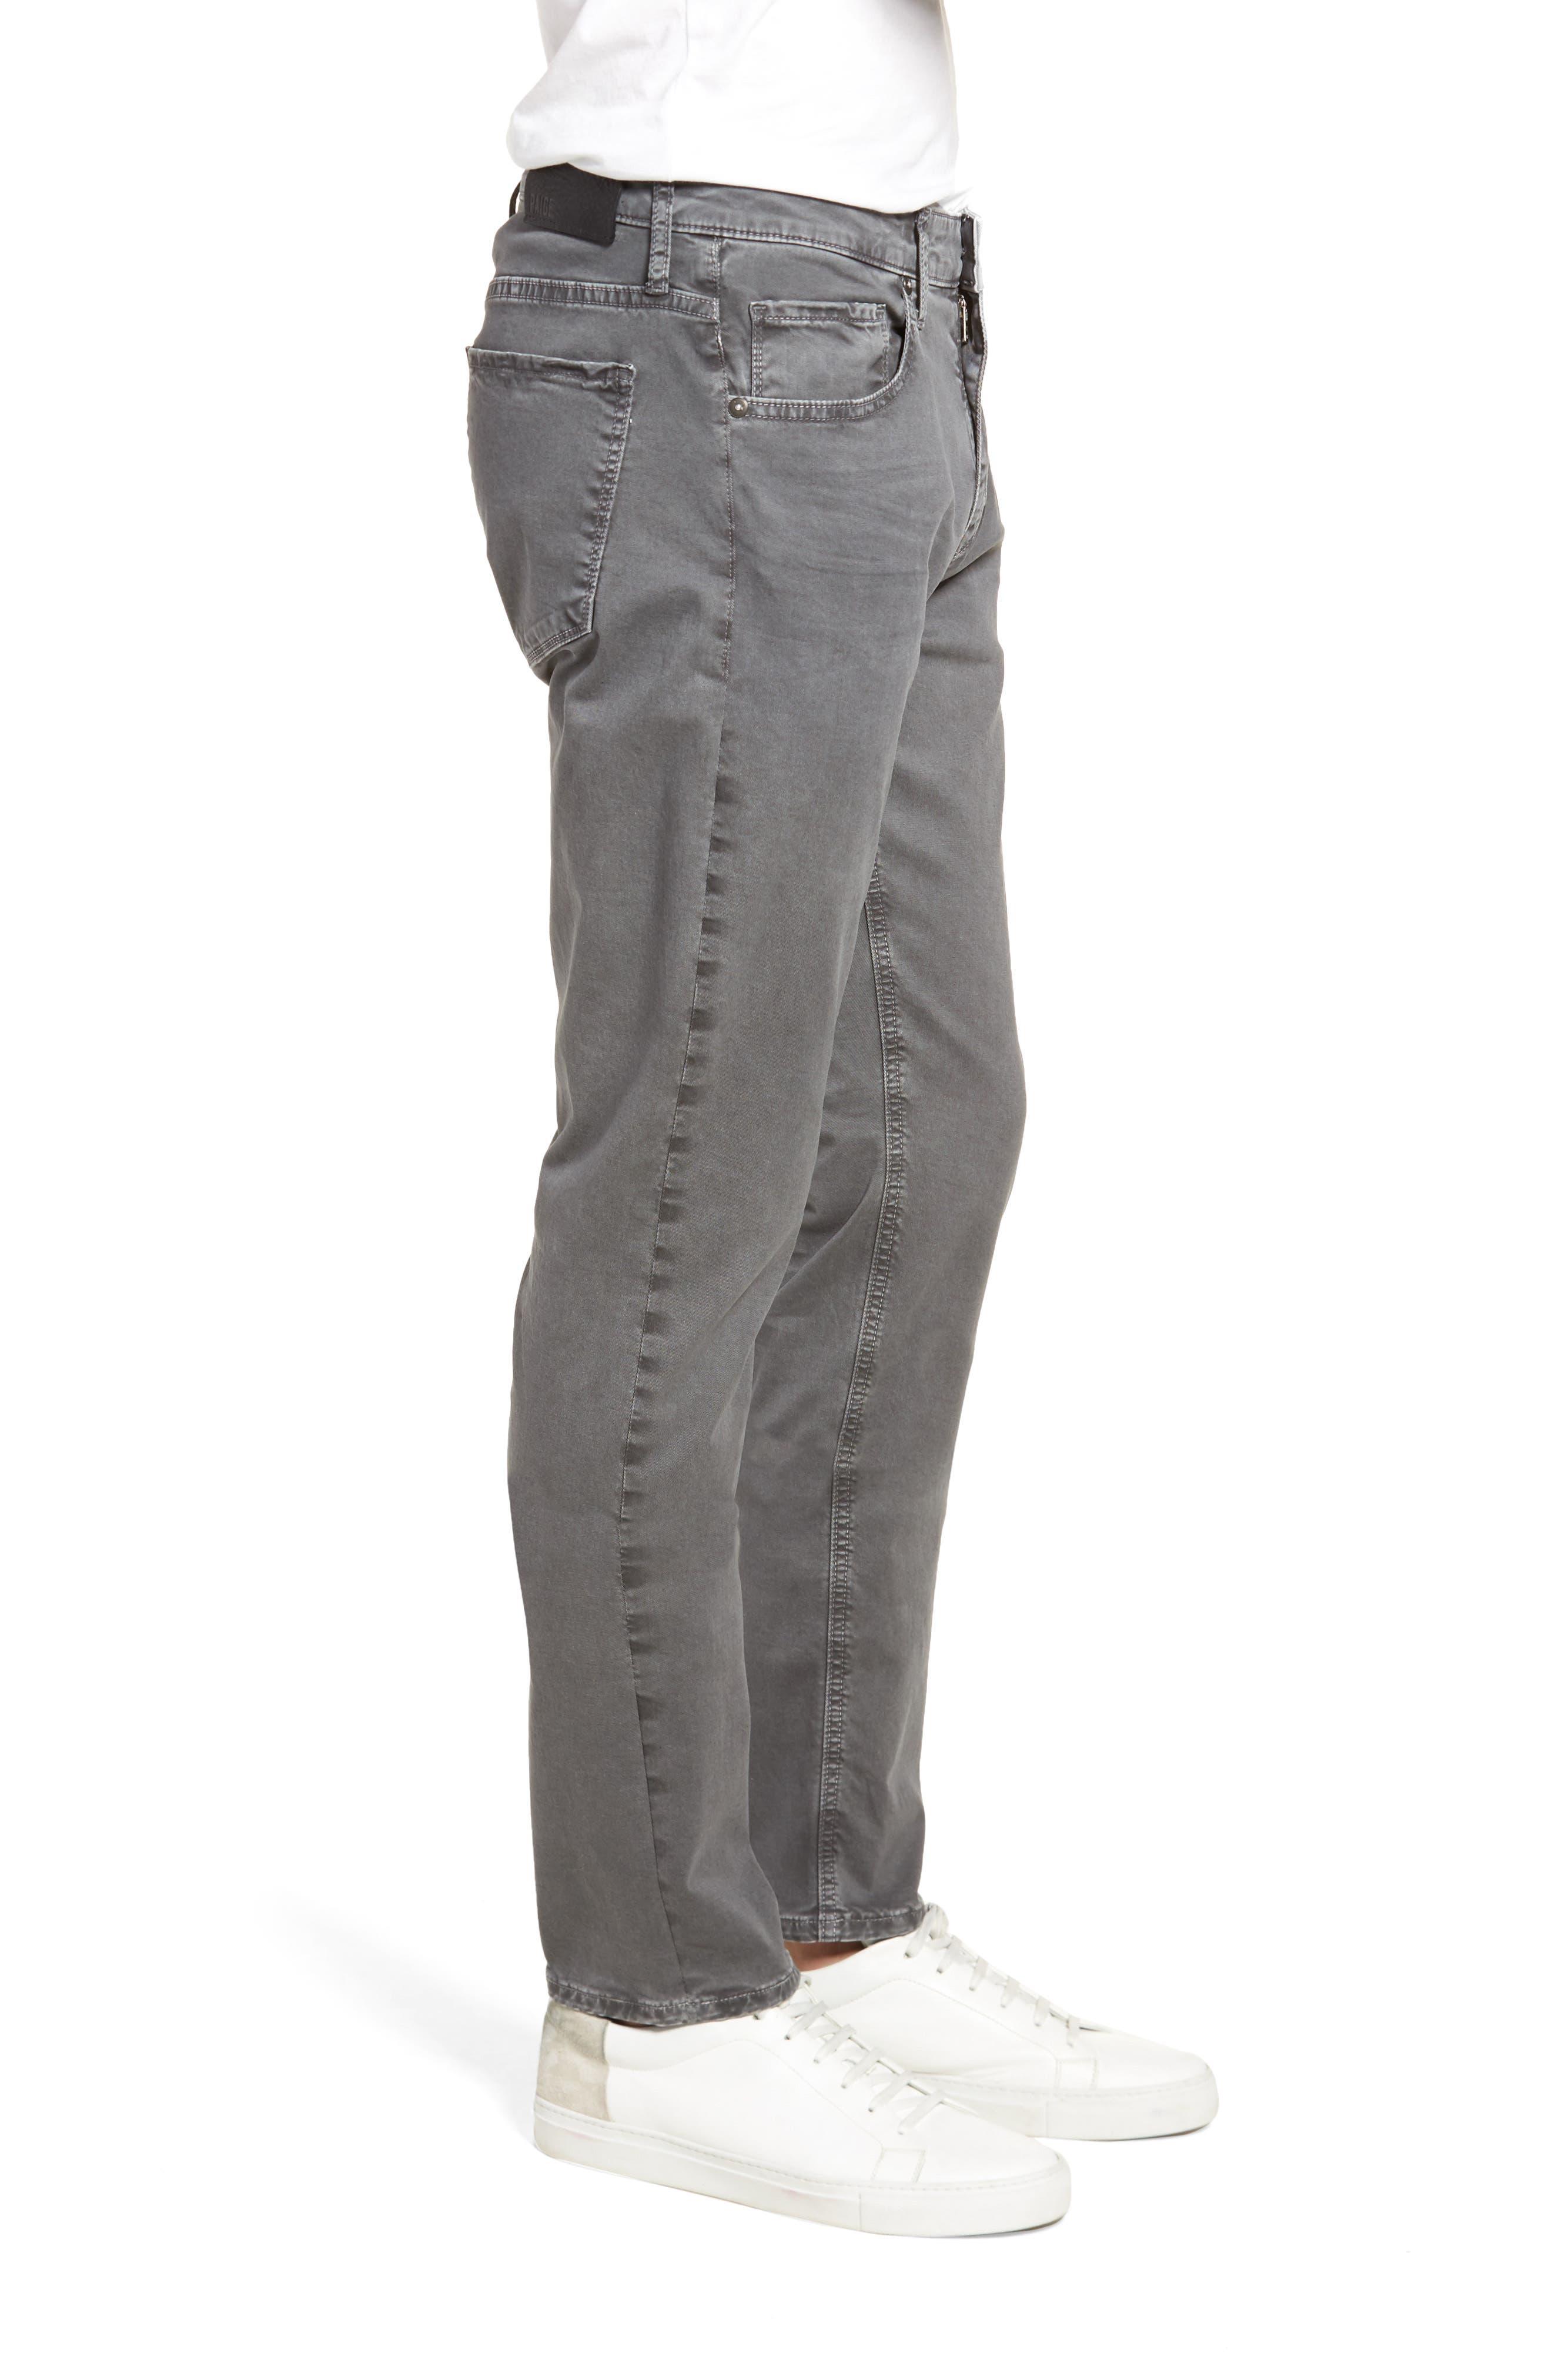 Lennox Slim Fit Five-Pocket Pants,                             Alternate thumbnail 3, color,                             VINTAGE THUNDER GREY